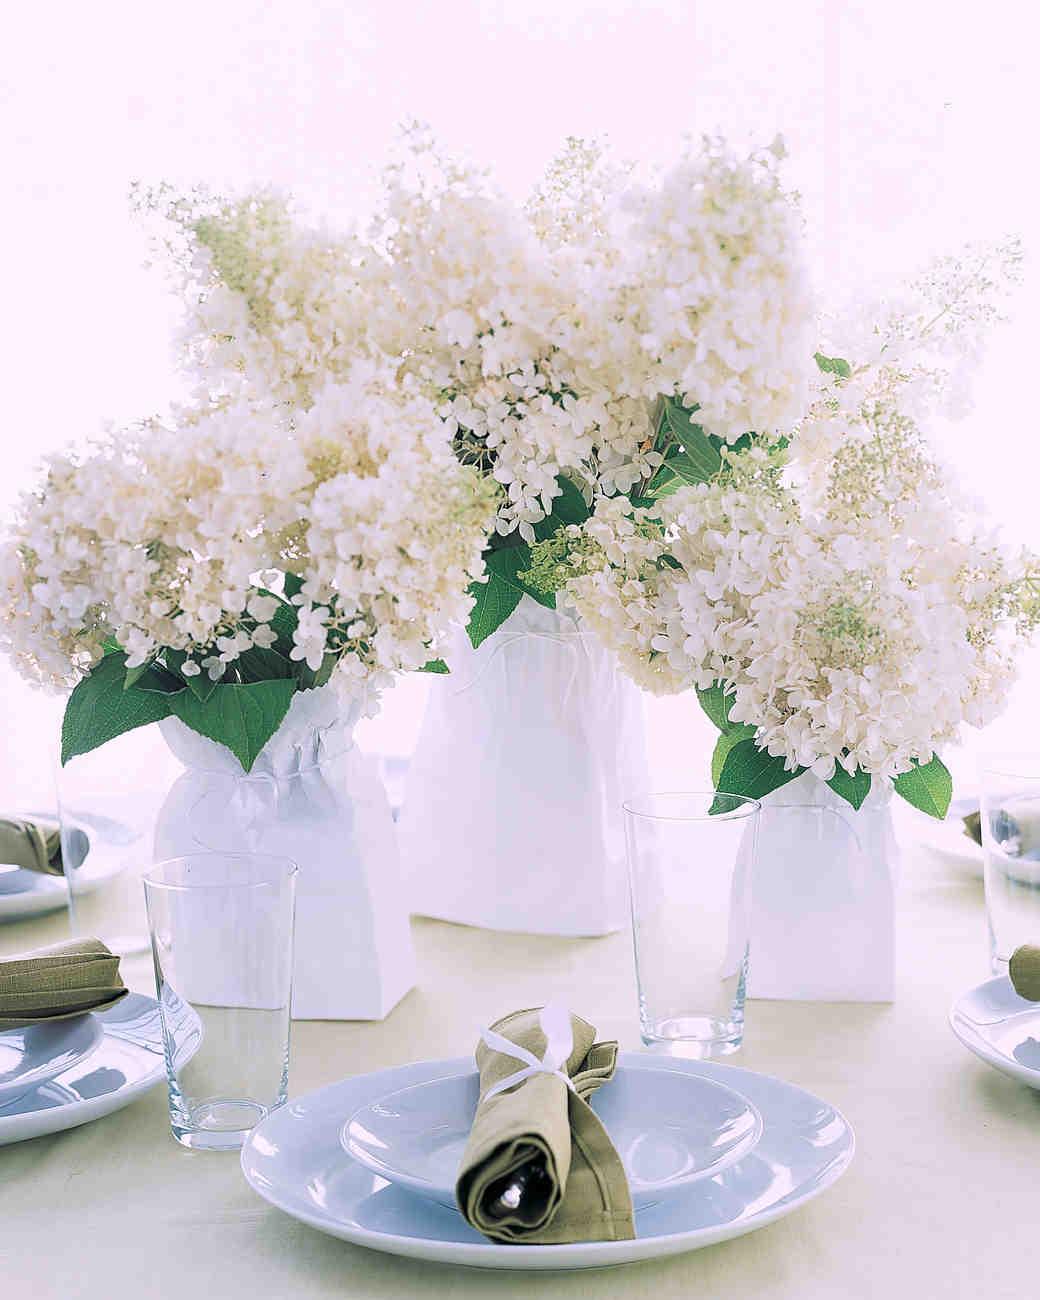 Affordable Wedding Centerpieces That Dont Look Cheap  Martha Stewart Weddings